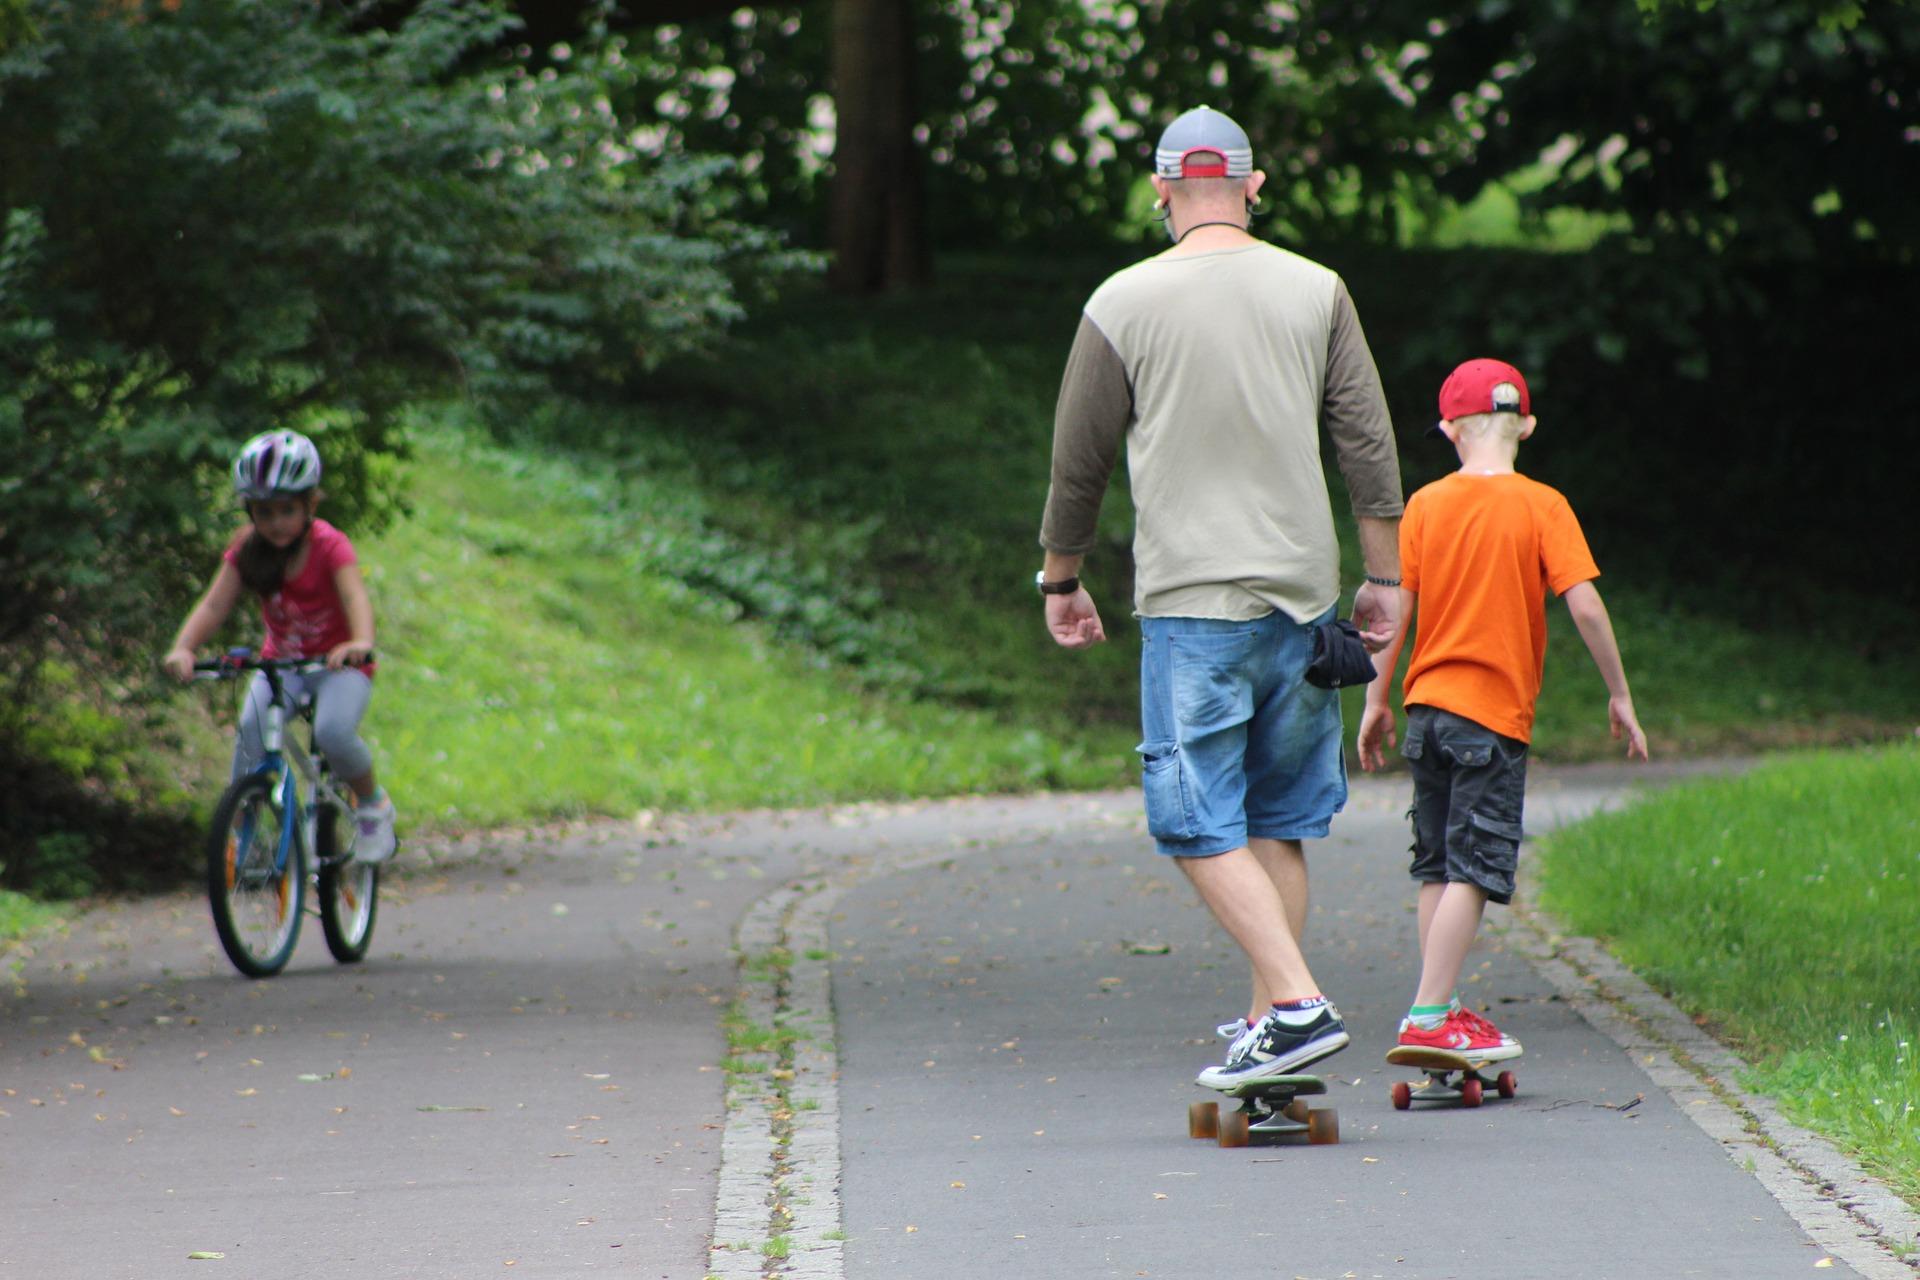 Padre e hijo realizando skate